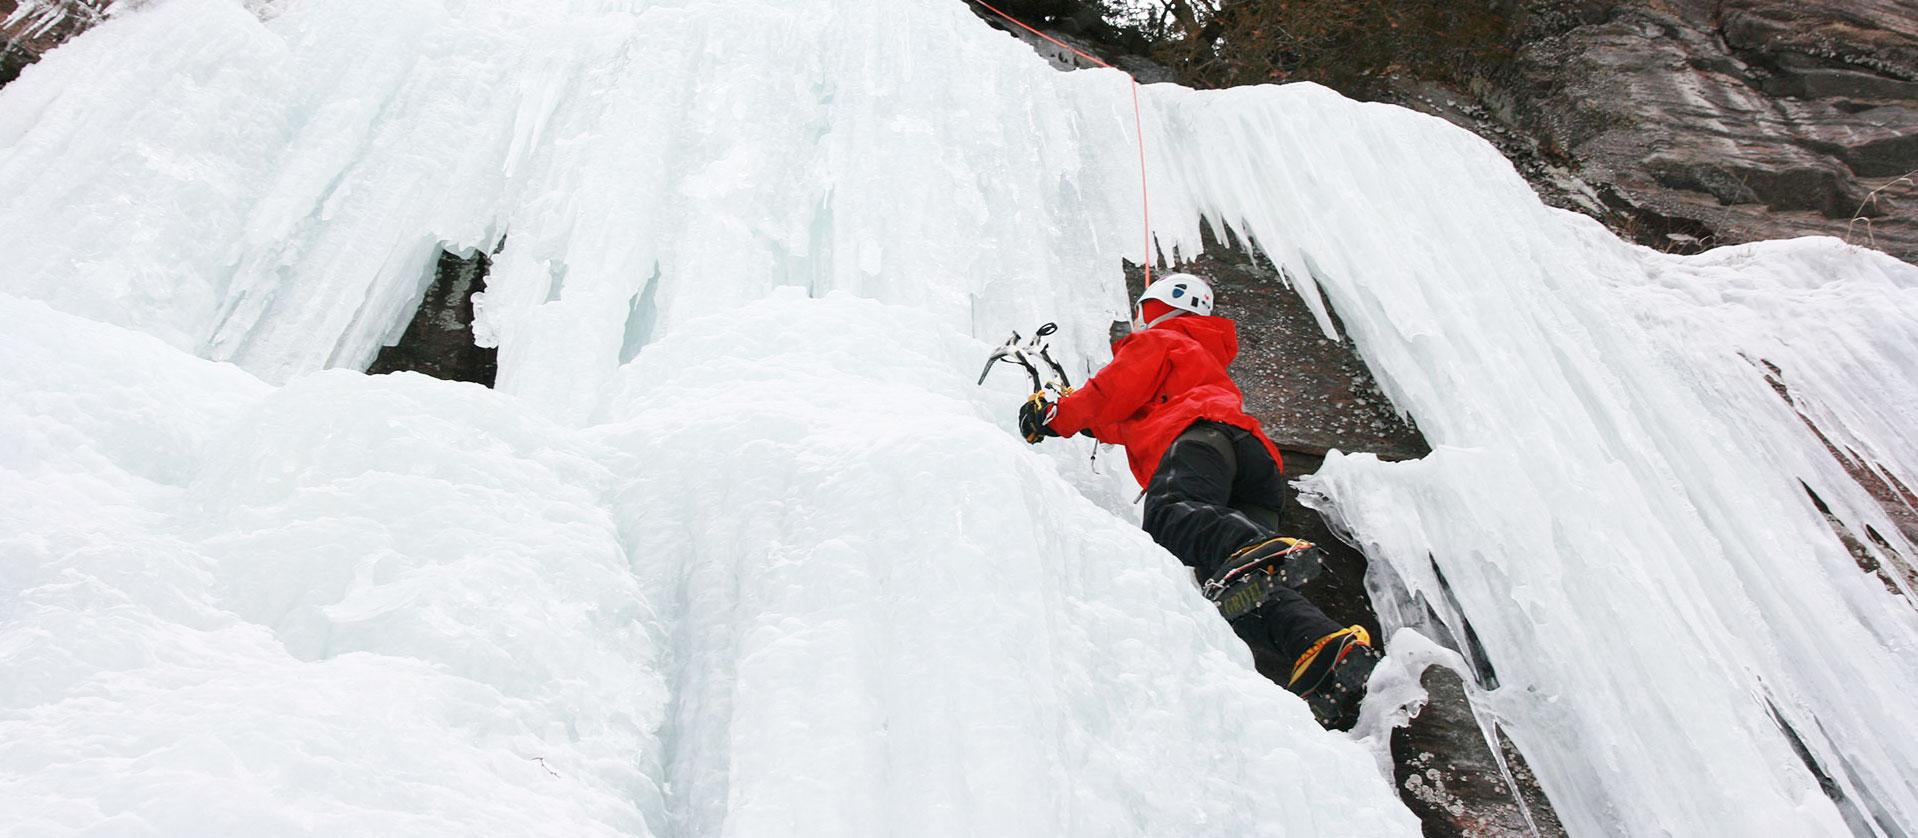 Ice Climbing – Intermediate Adventure